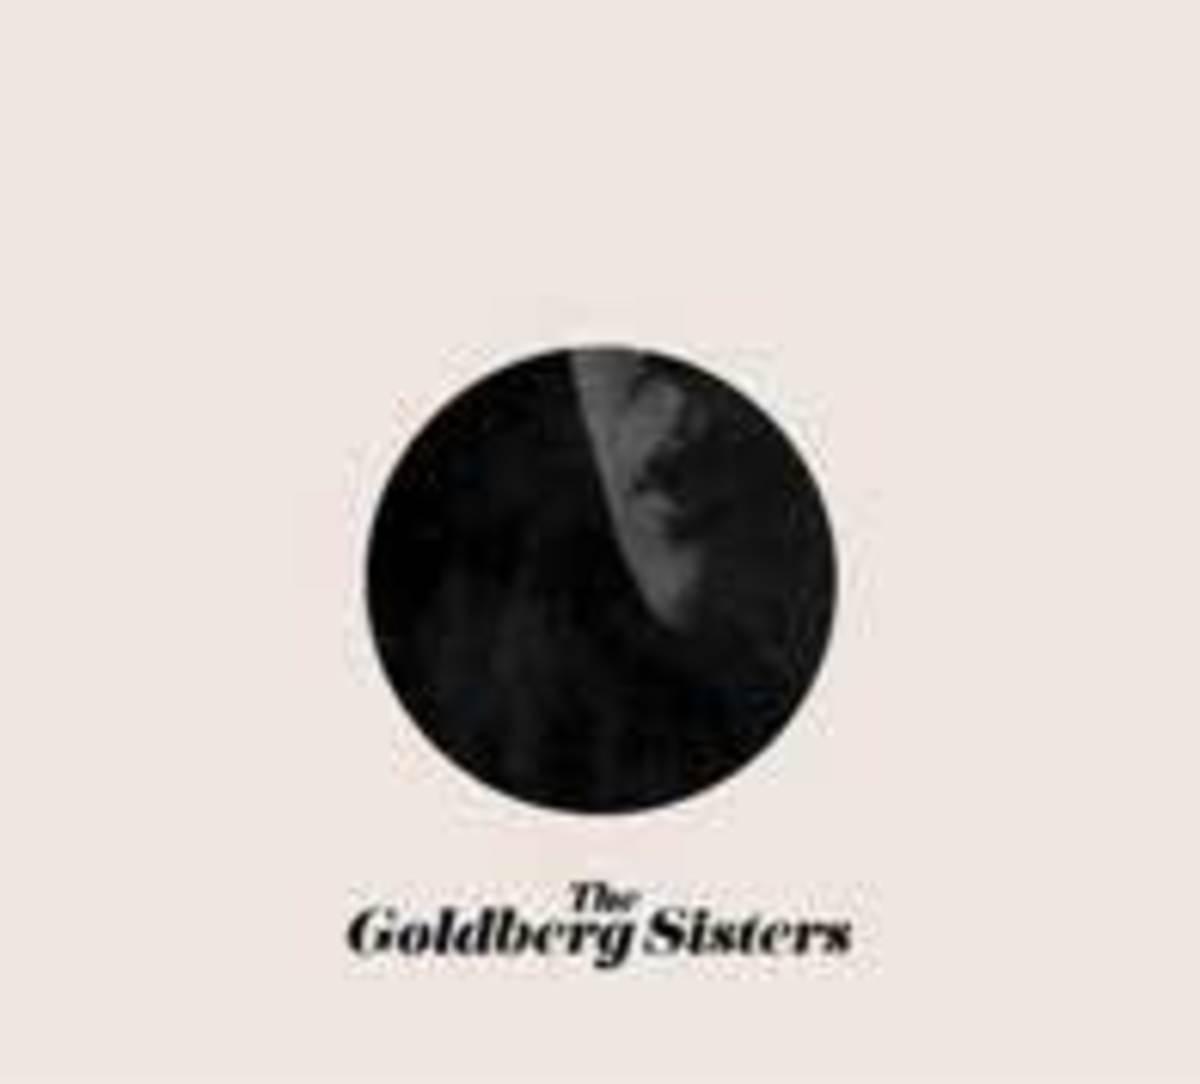 goldberg_sisters